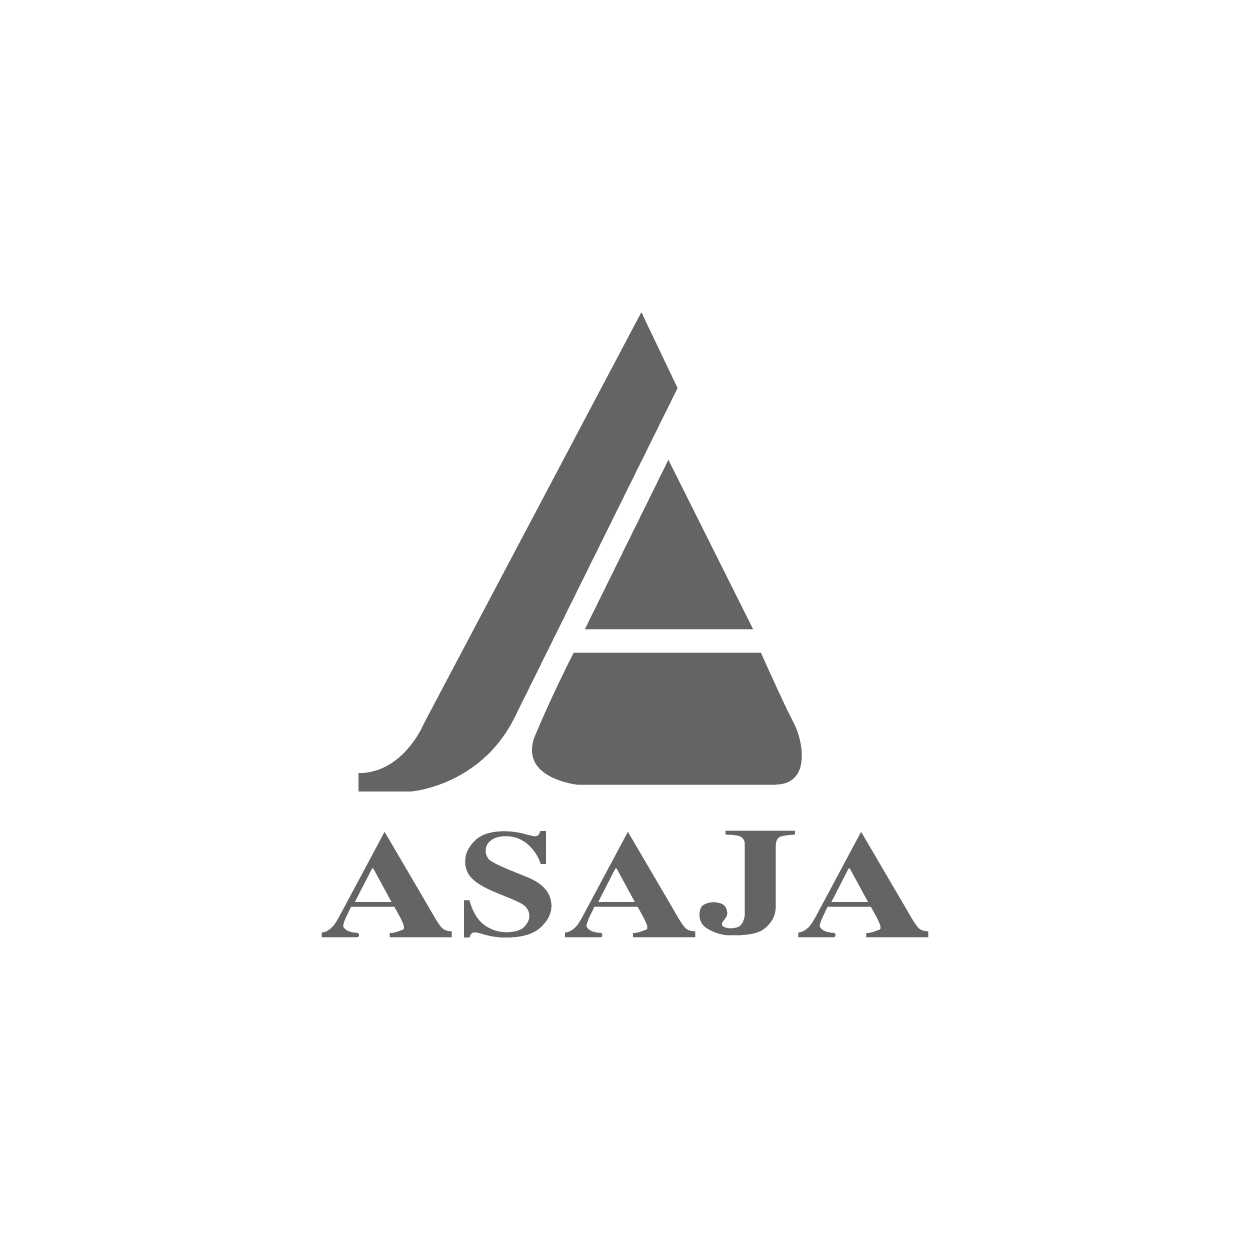 logo_ASAJA.png